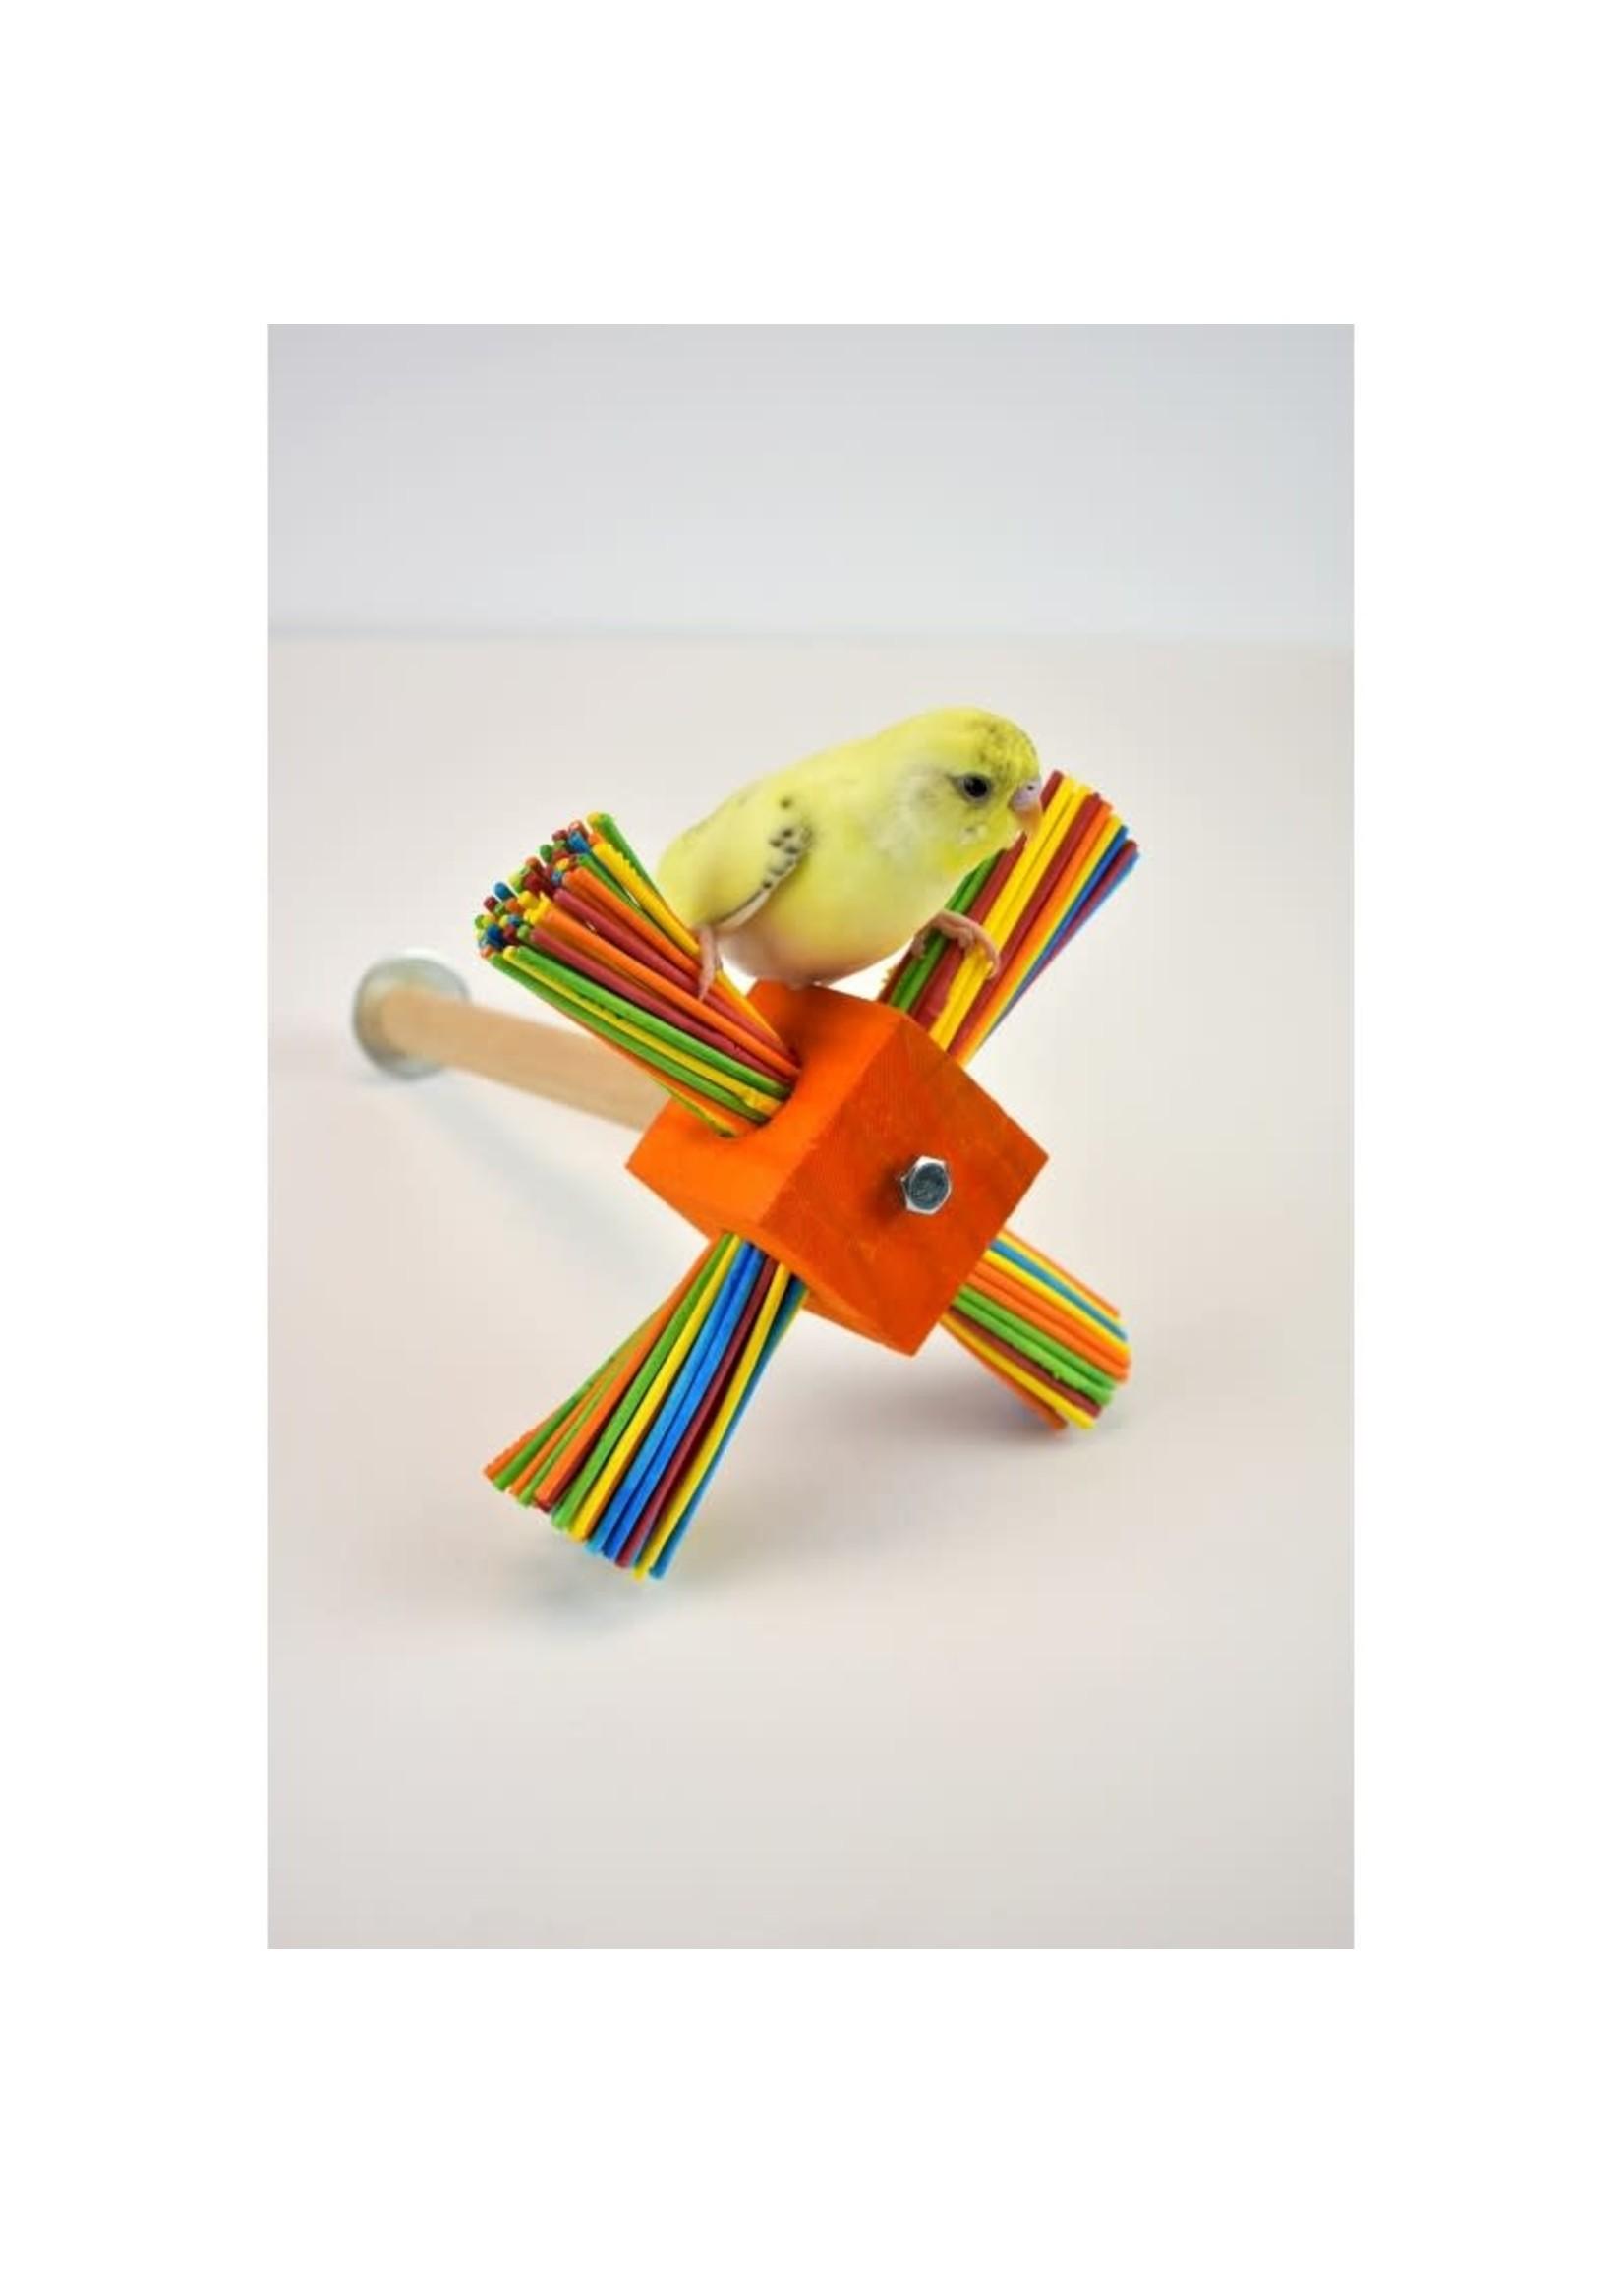 Glitter Pets GP Wood Spinner Perch A348